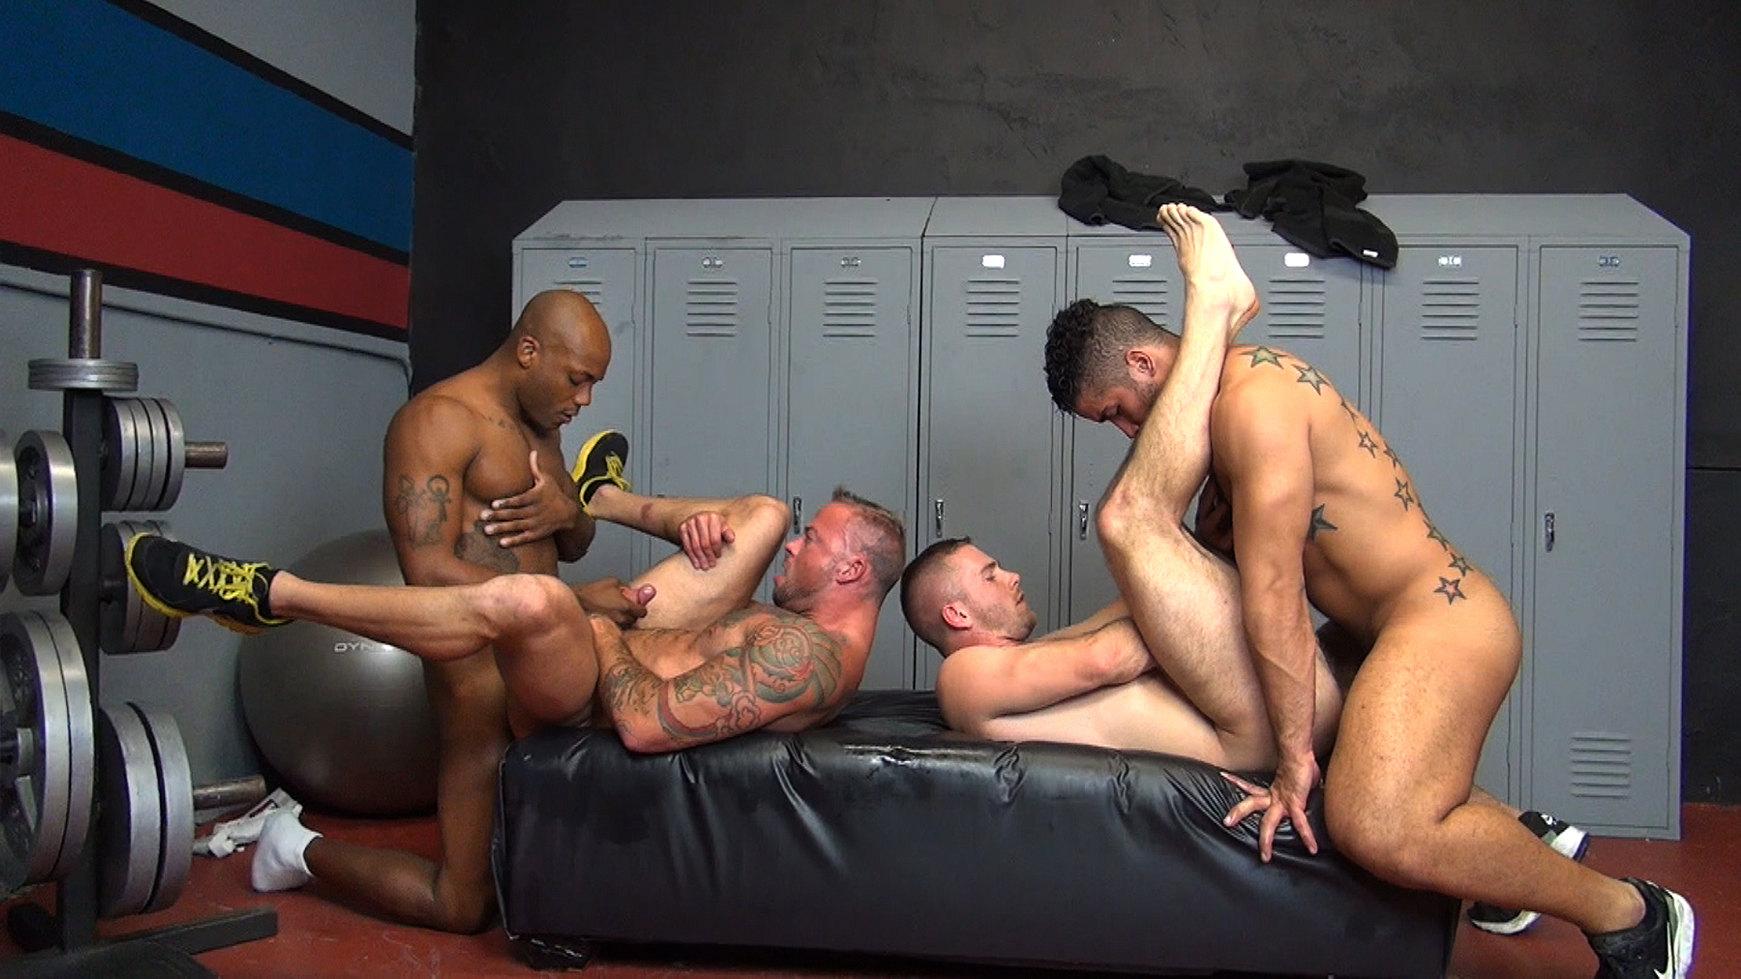 strip-club-osiris-blade-gay-porn-ass-wifes